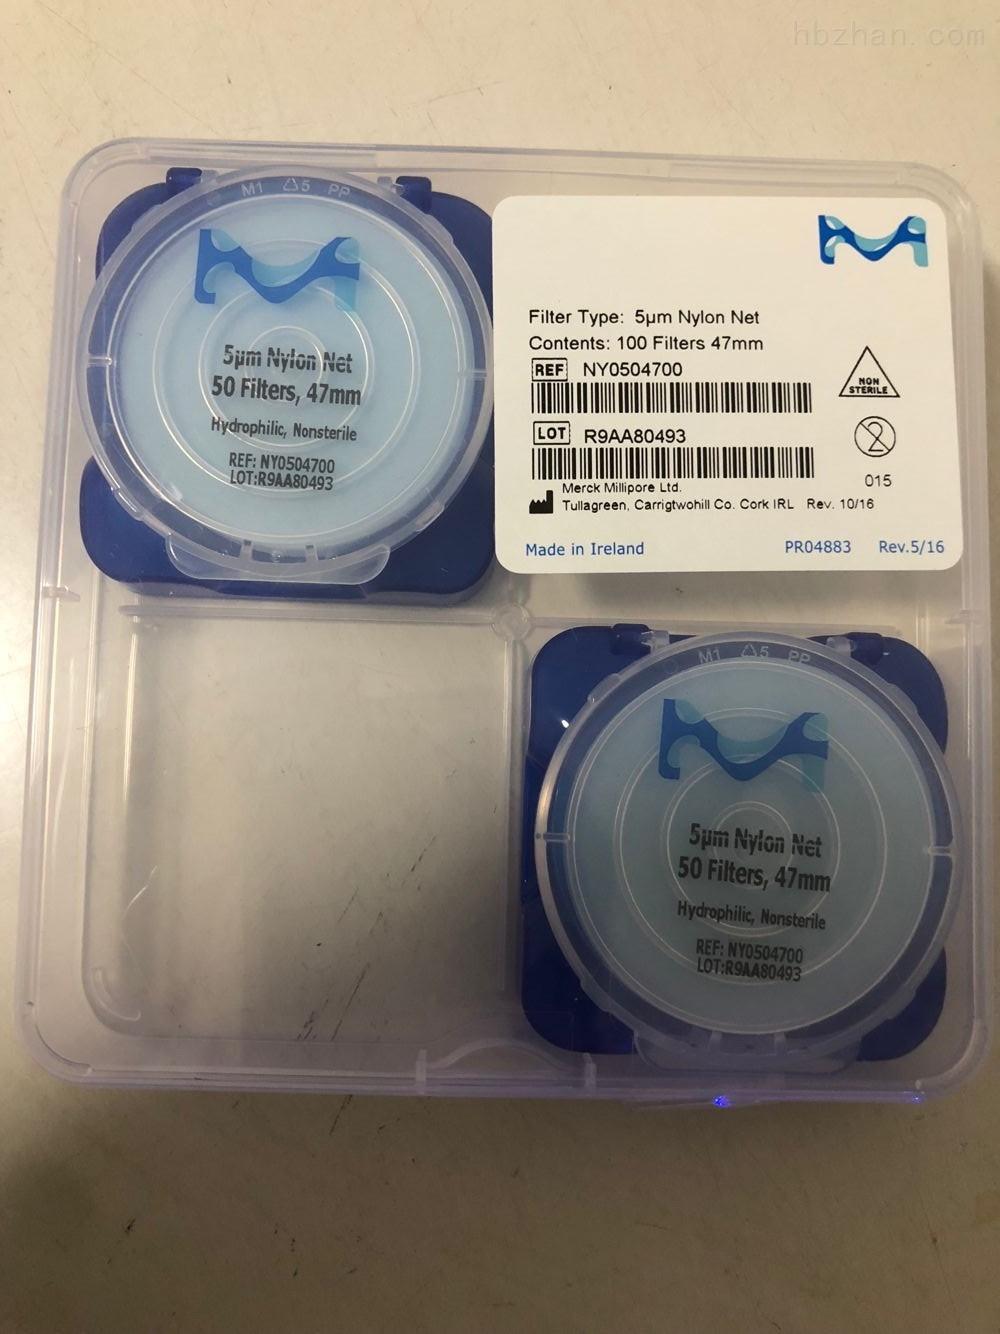 millipore清洁度检测专用尼龙网格滤膜5um